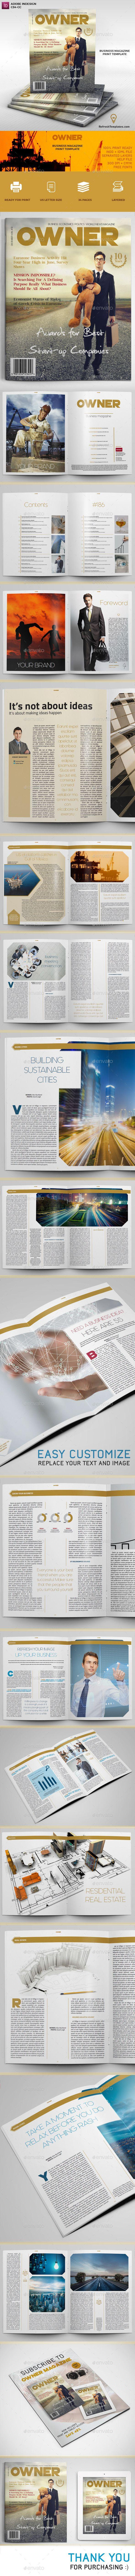 Owner - Business Magazine Template #design Download: http://graphicriver.net/item/owner-business-magazine/12482183?ref=ksioks